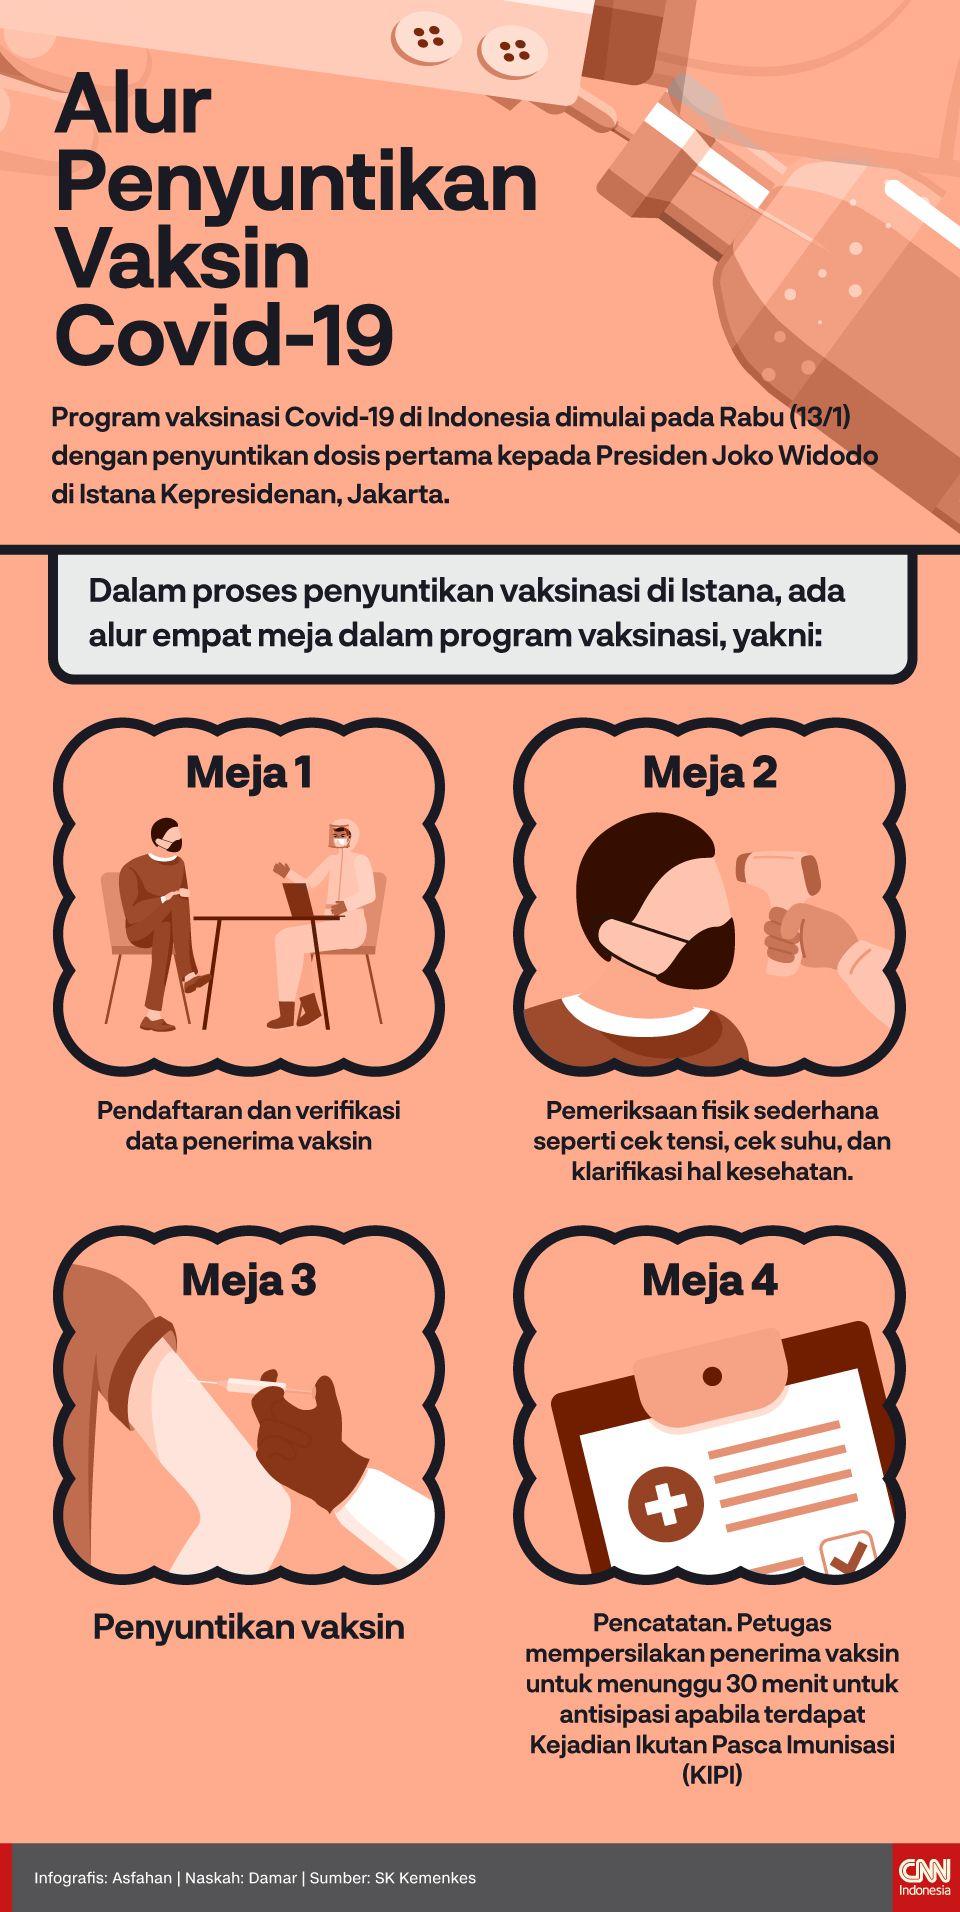 Infografis Alur Penyuntikan Vaksin Covid-19